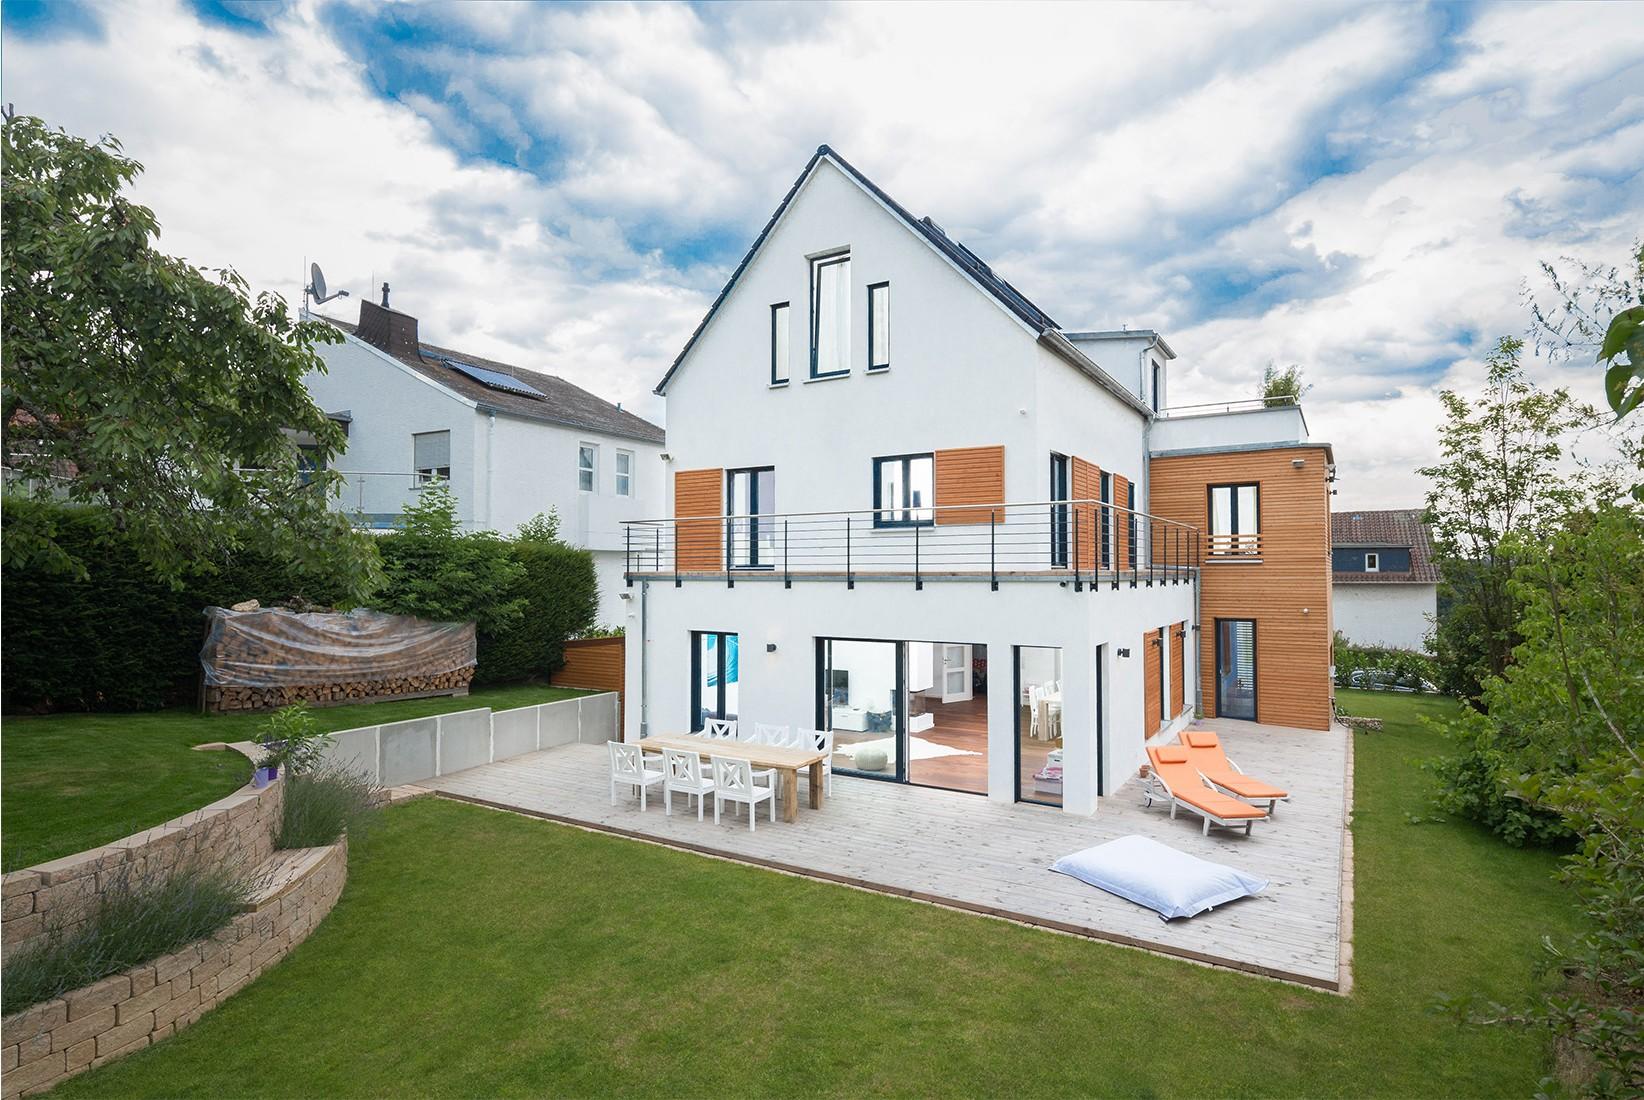 00023-Fotograf-Architektur-Achitecture-exterior-Werbefotograf-Stuttgart-Andreas-Martin